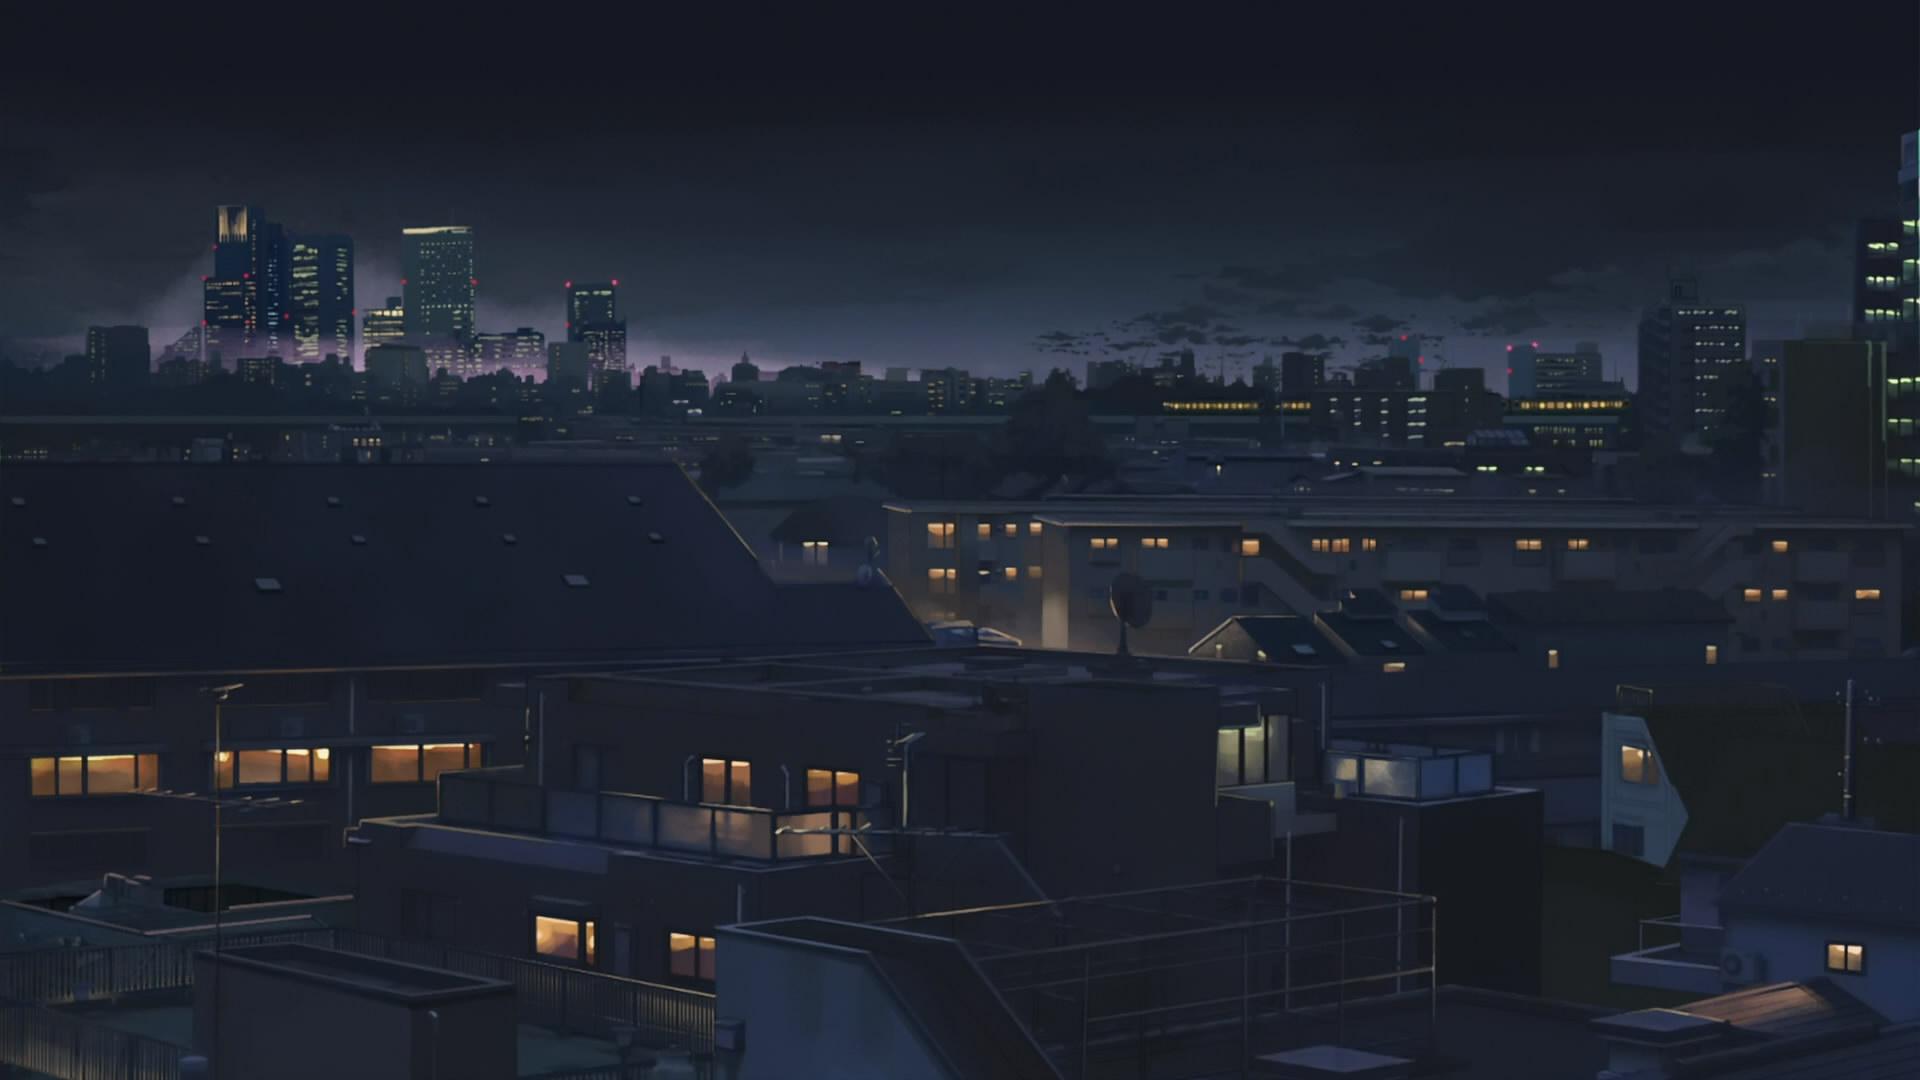 13 wonderful hd anime city wallpapers - Anime backdrop wallpaper ...